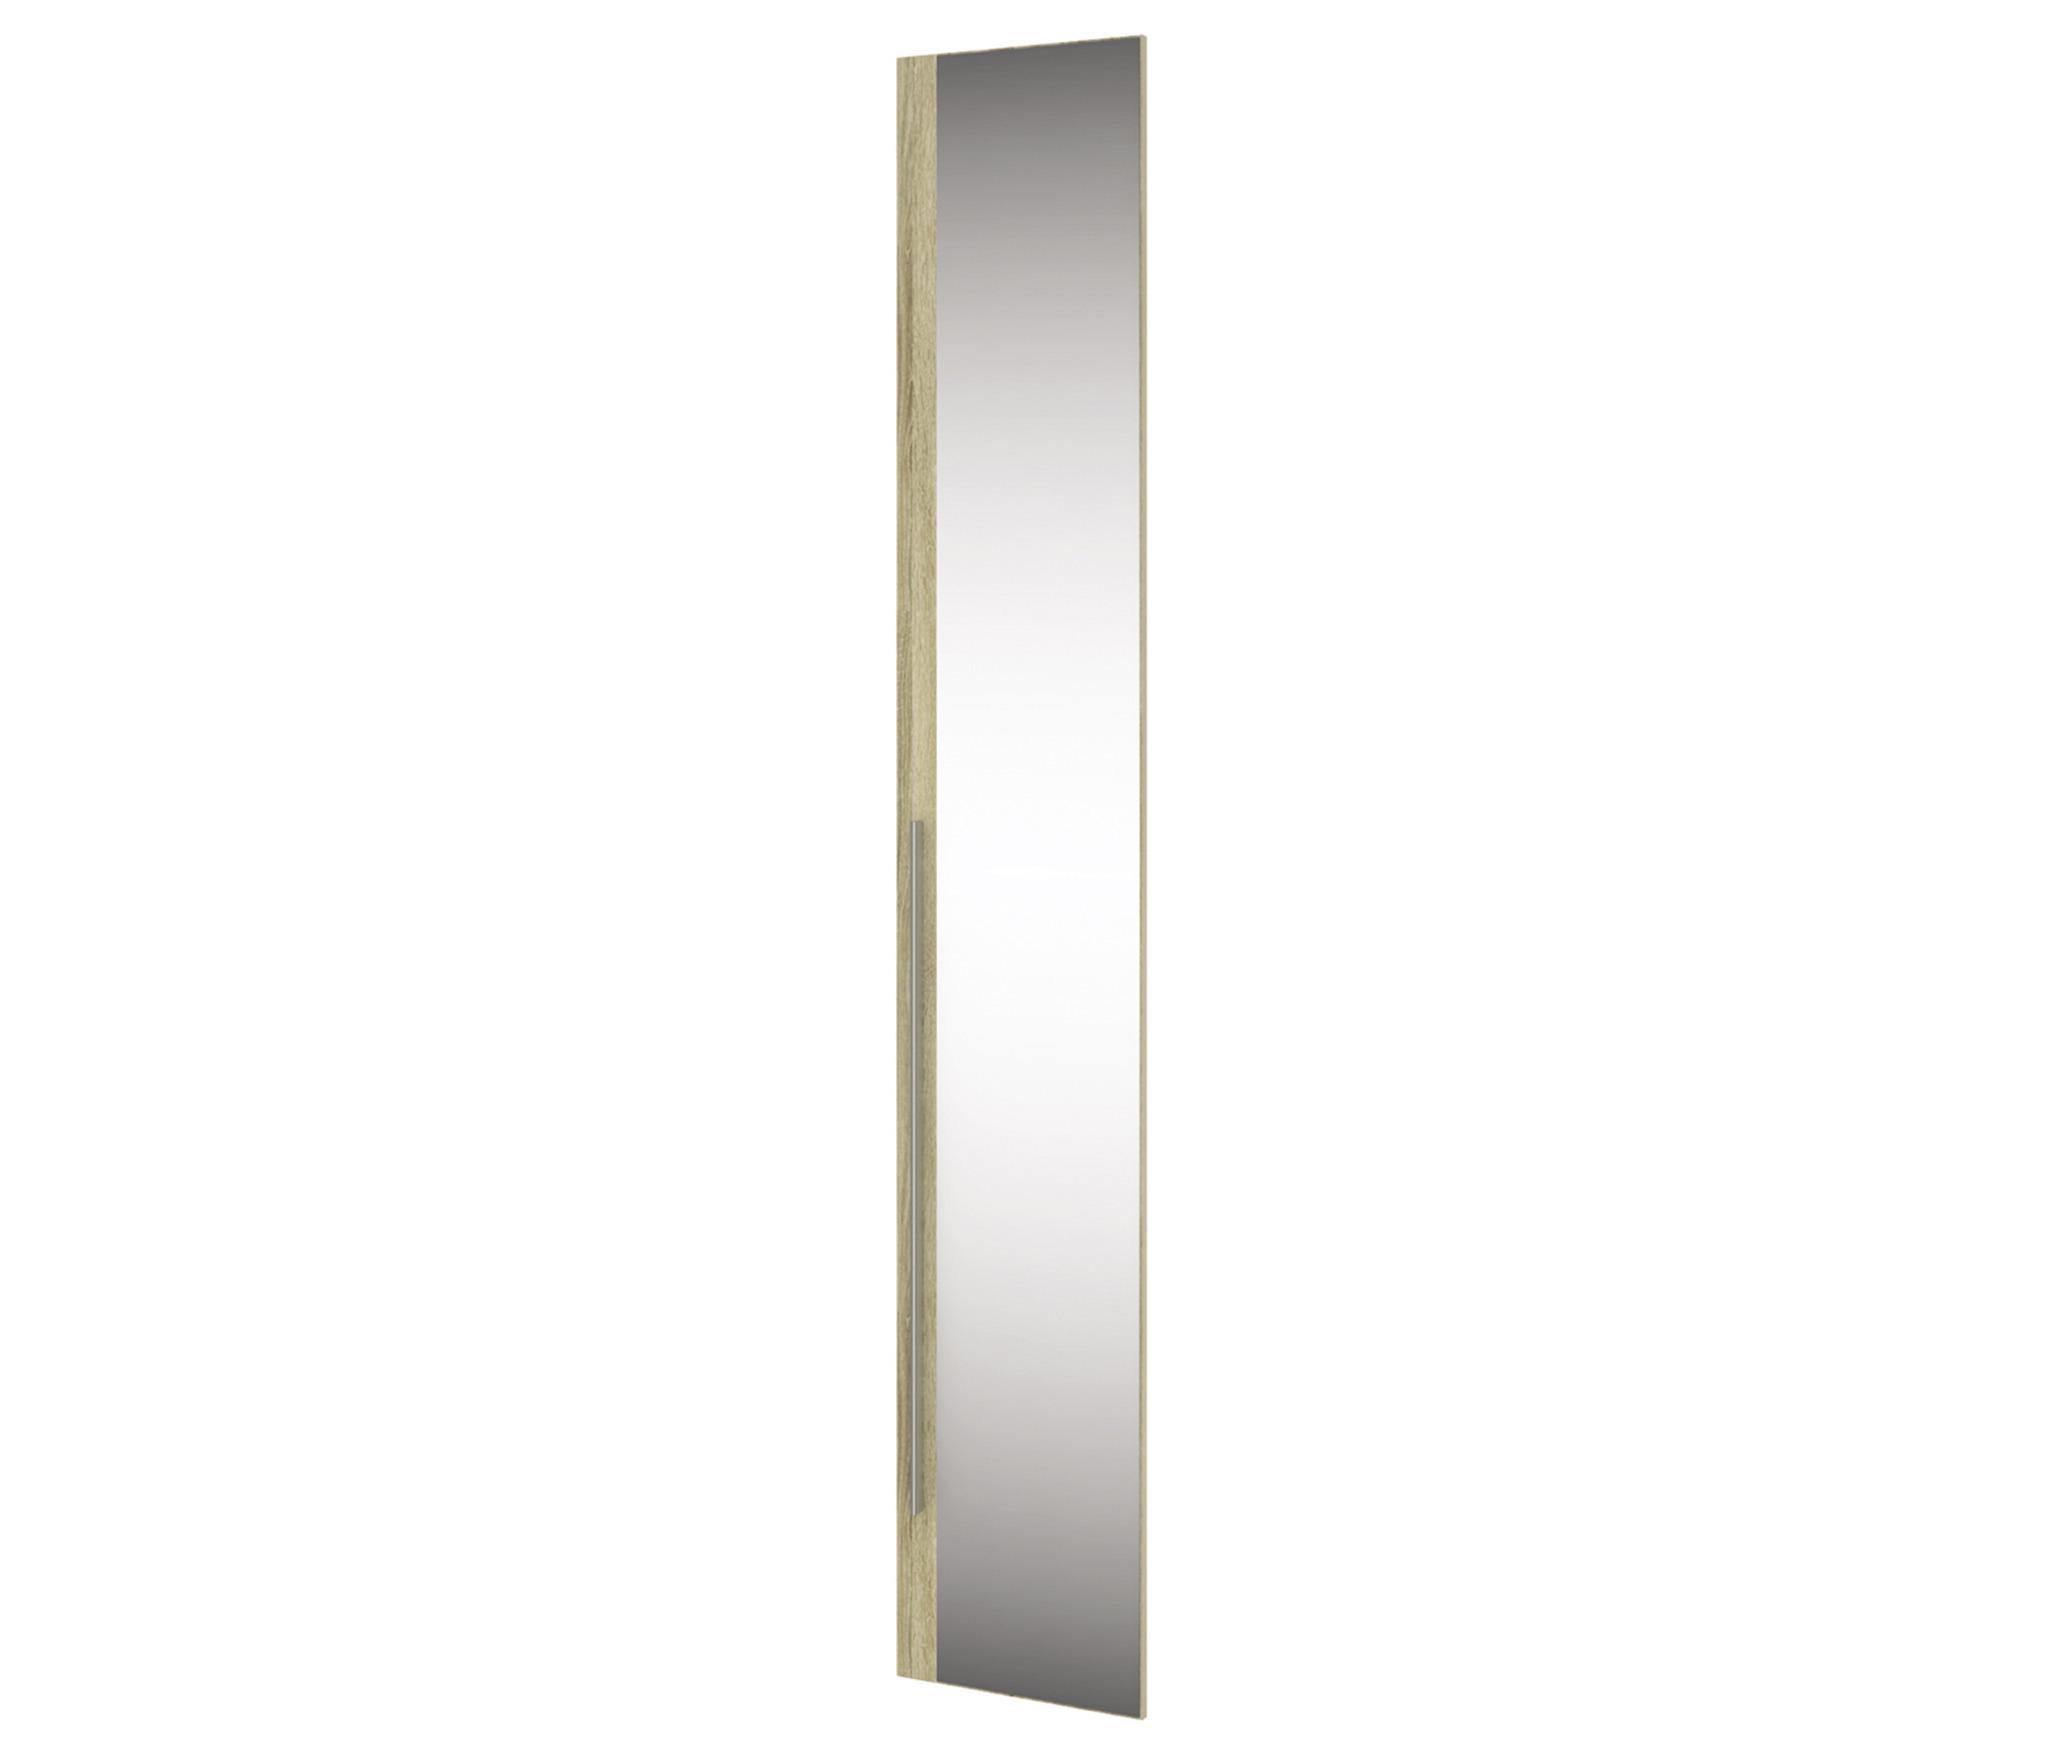 Ирма СТЛ.143.19 Фасад с зеркаломМебель для спальни<br><br><br>Длина мм: 392<br>Высота мм: 2356<br>Глубина мм: 20